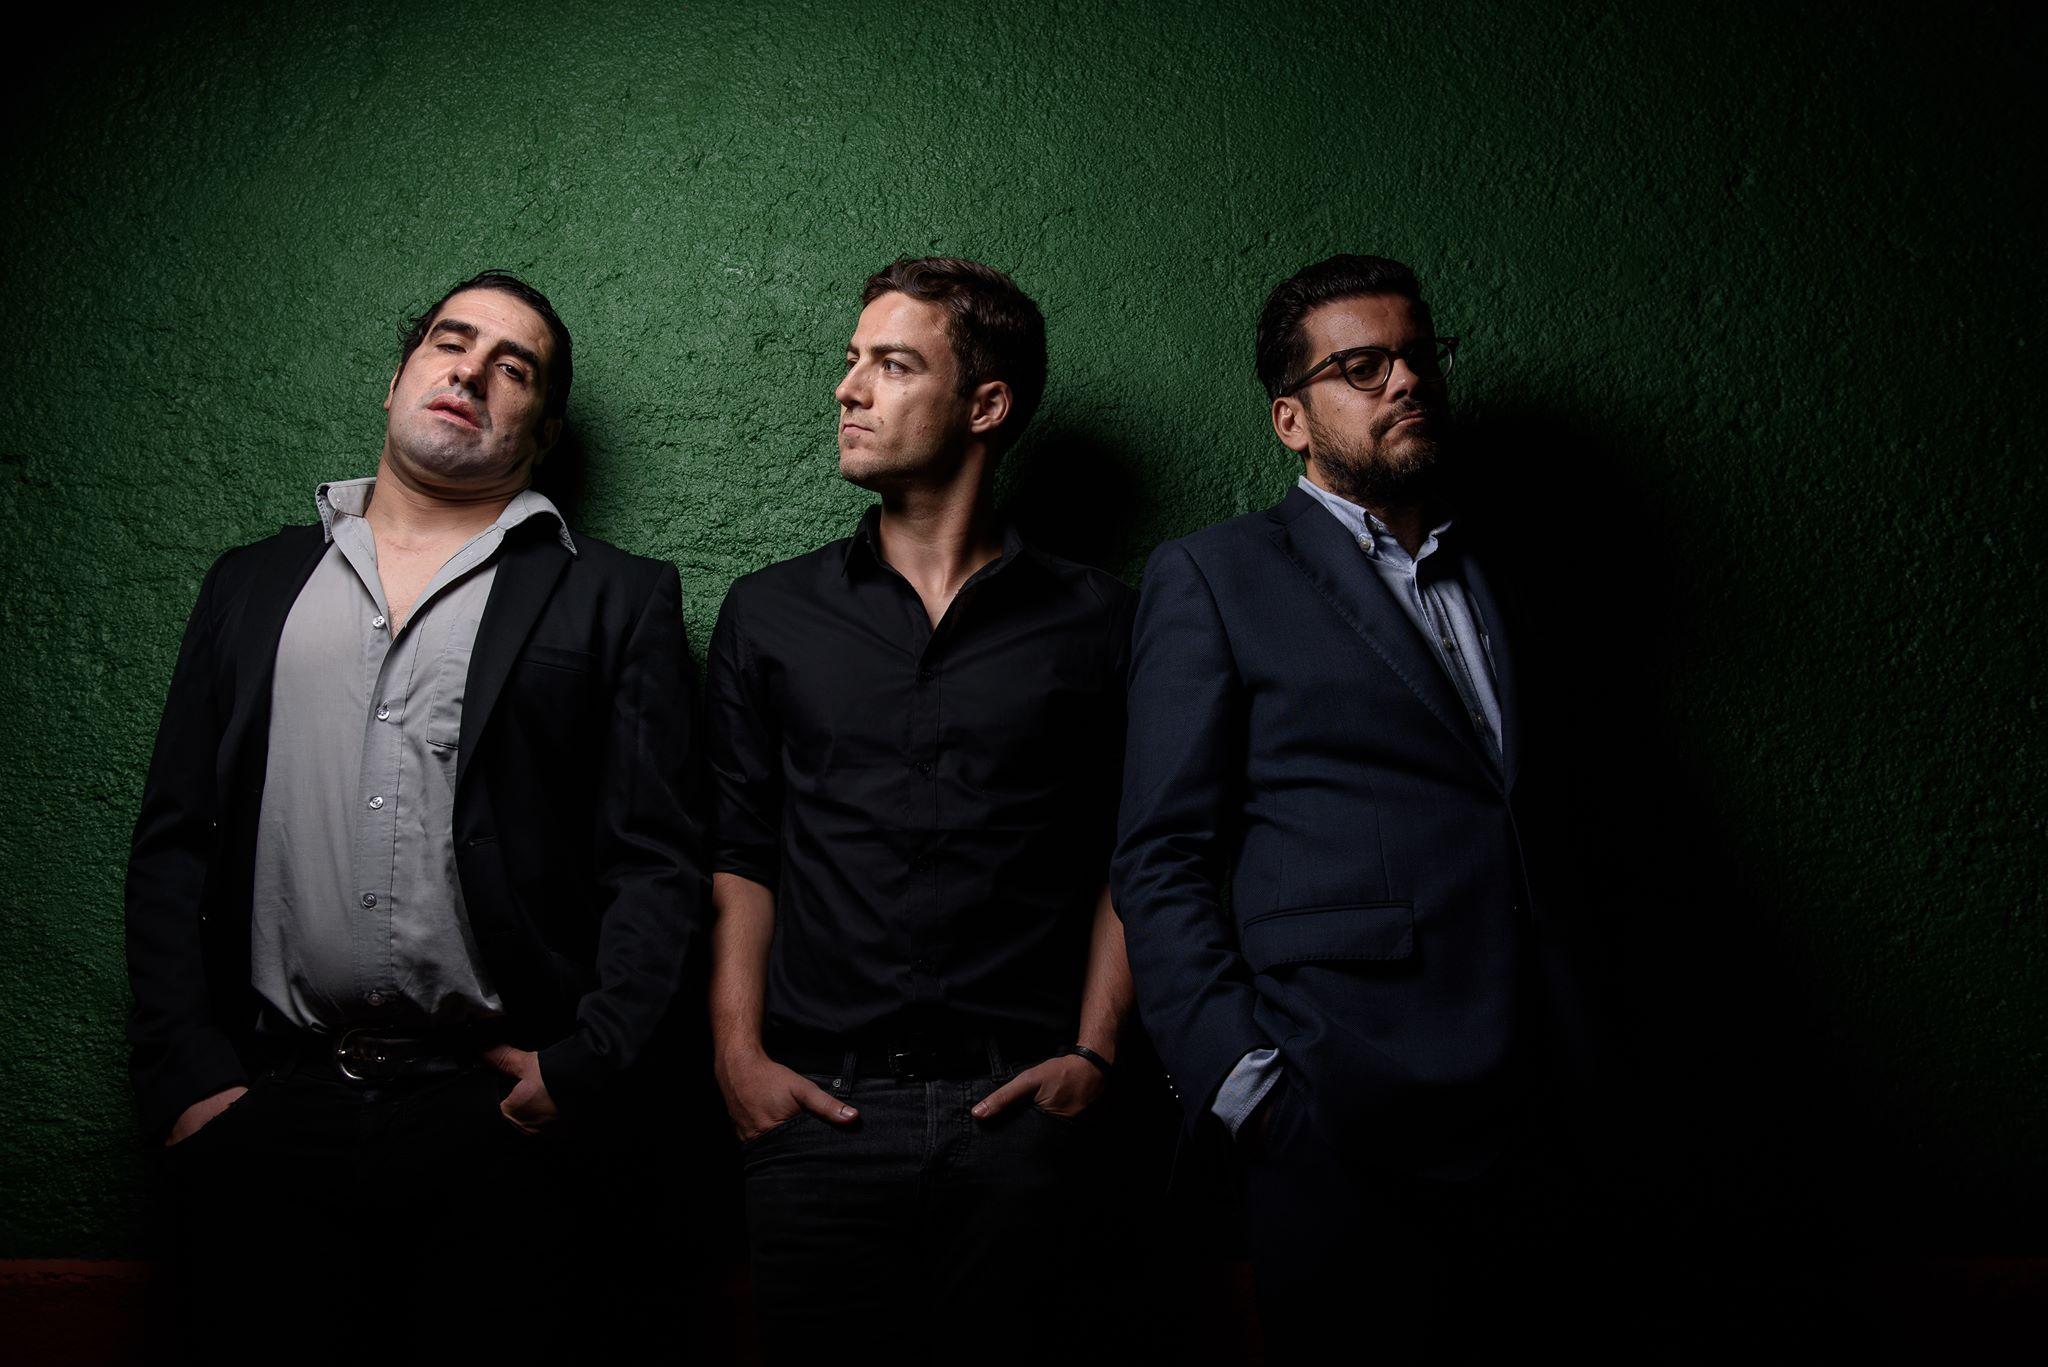 The Twist Connection, o trio que quer agitar o rock and roll